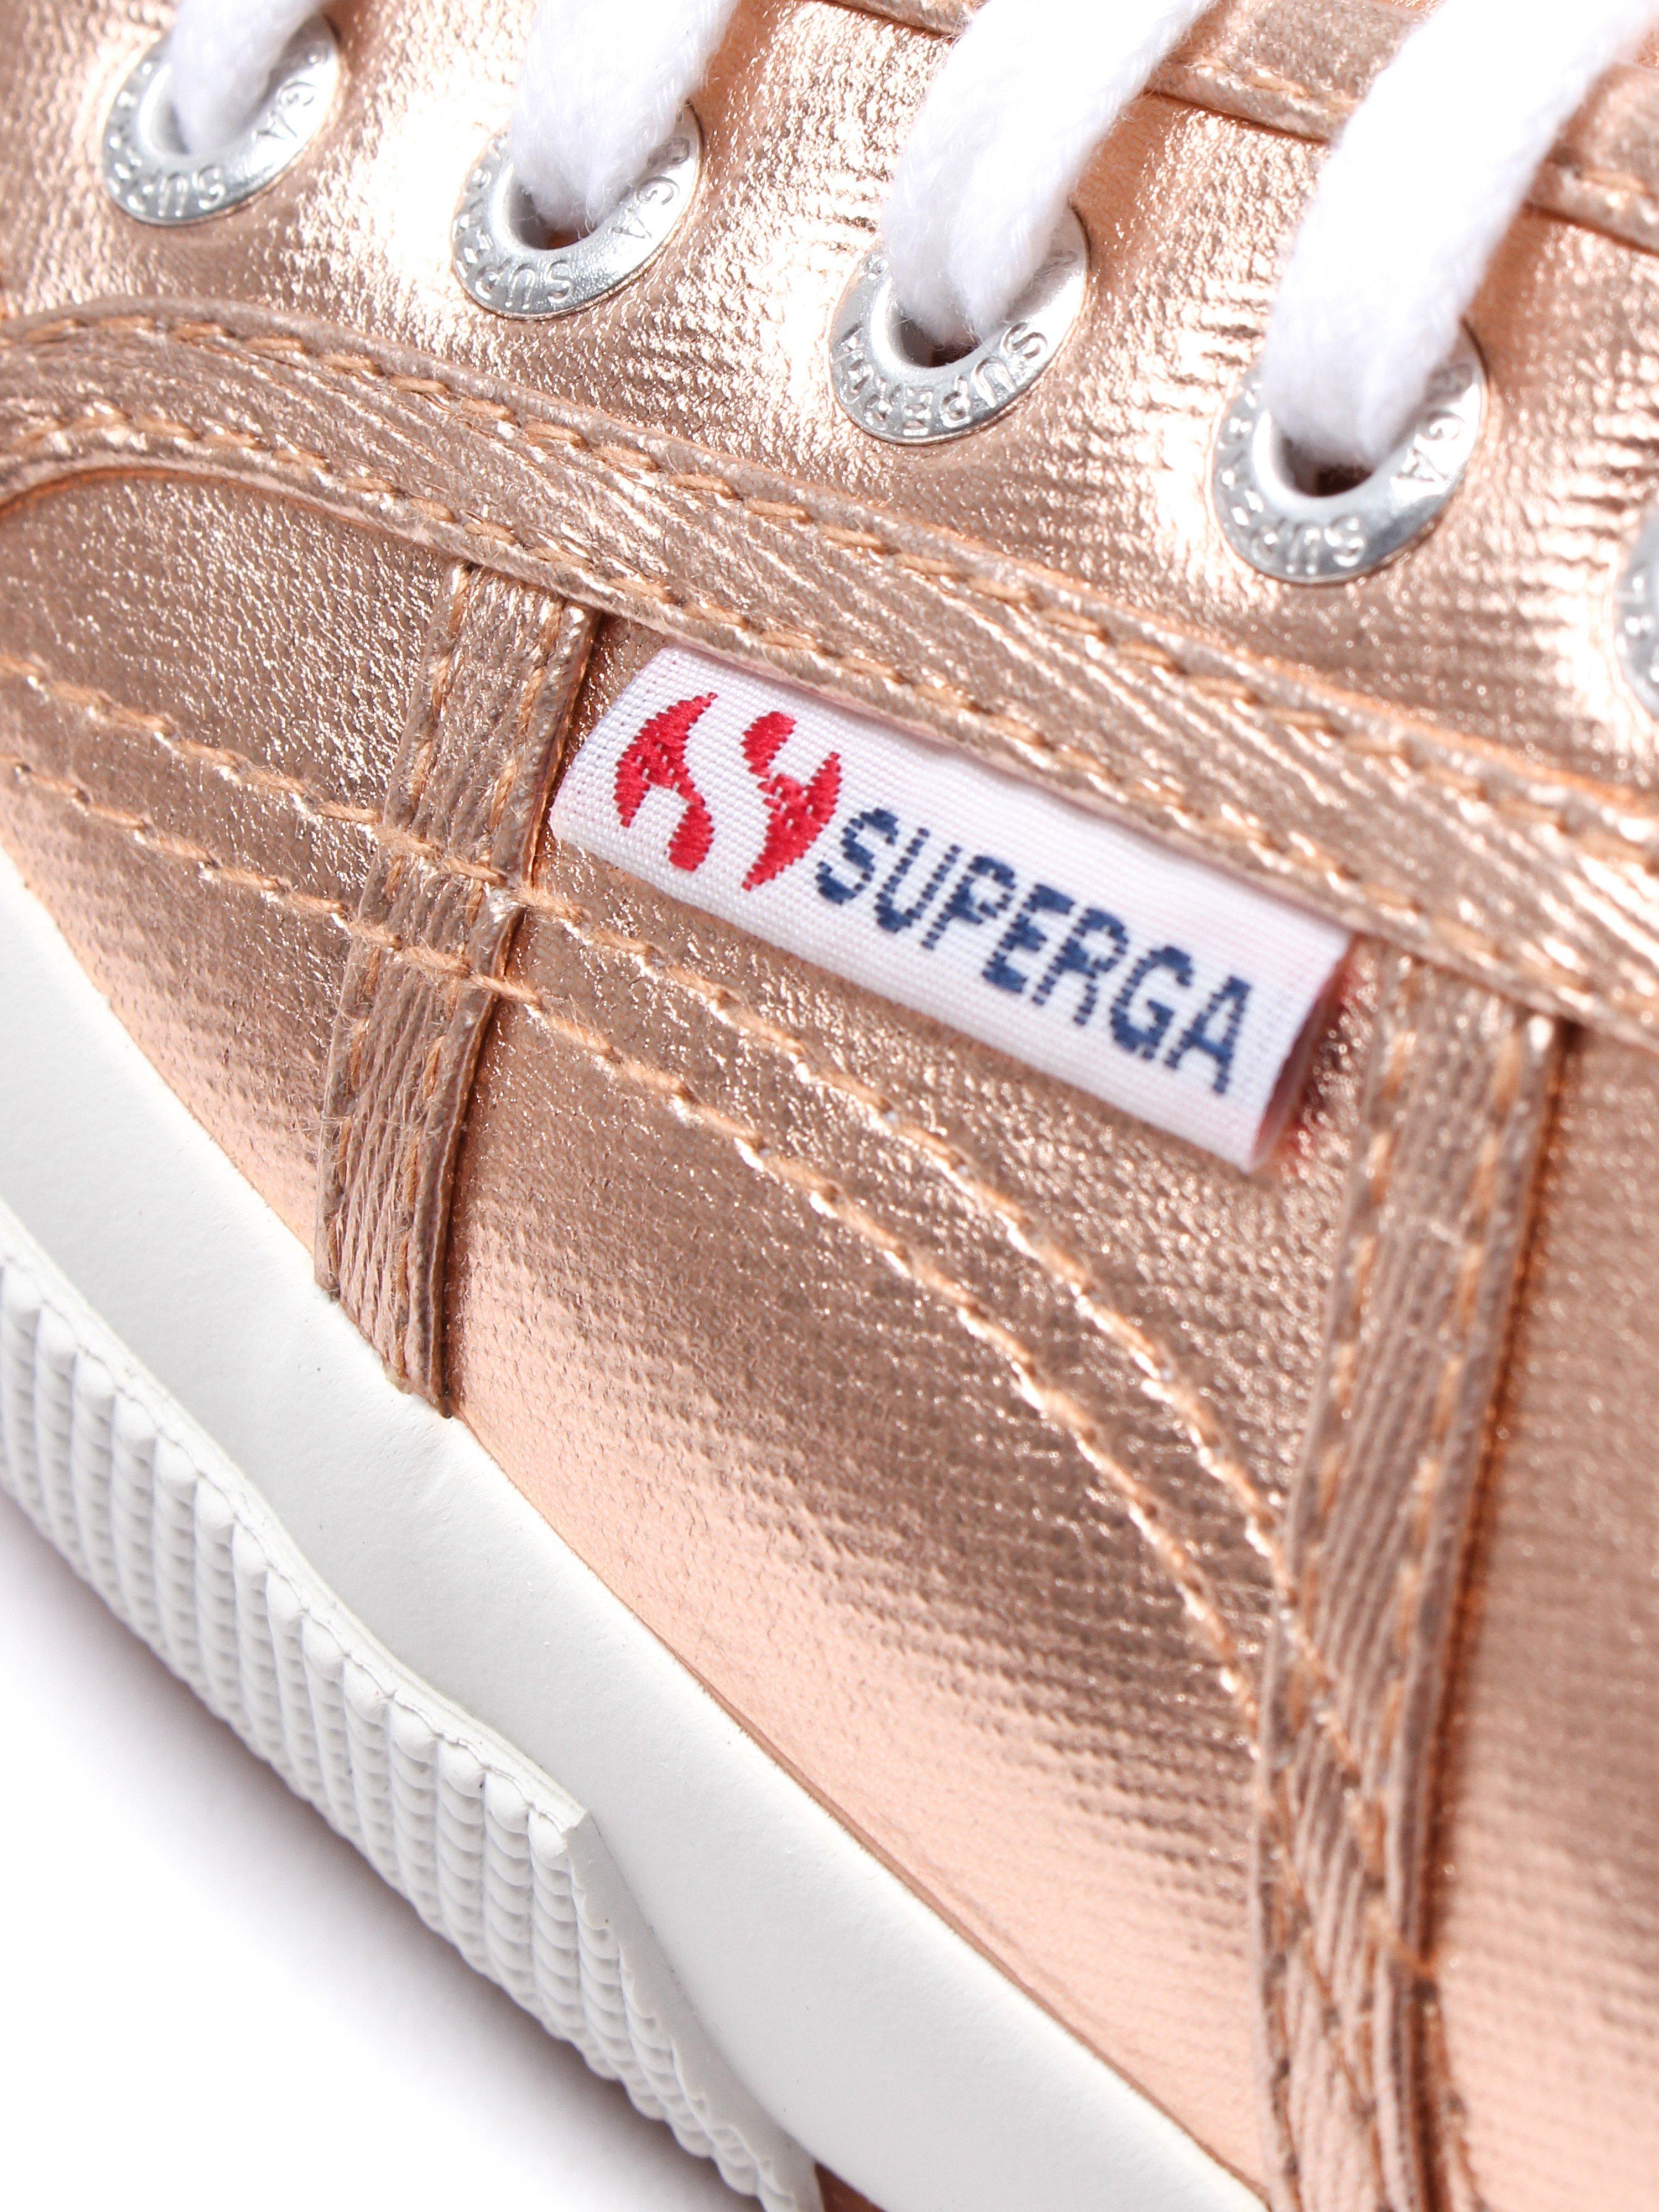 Superga Women's 2750 Cotmetu Metallic Canvas Trainers - Rose Gold